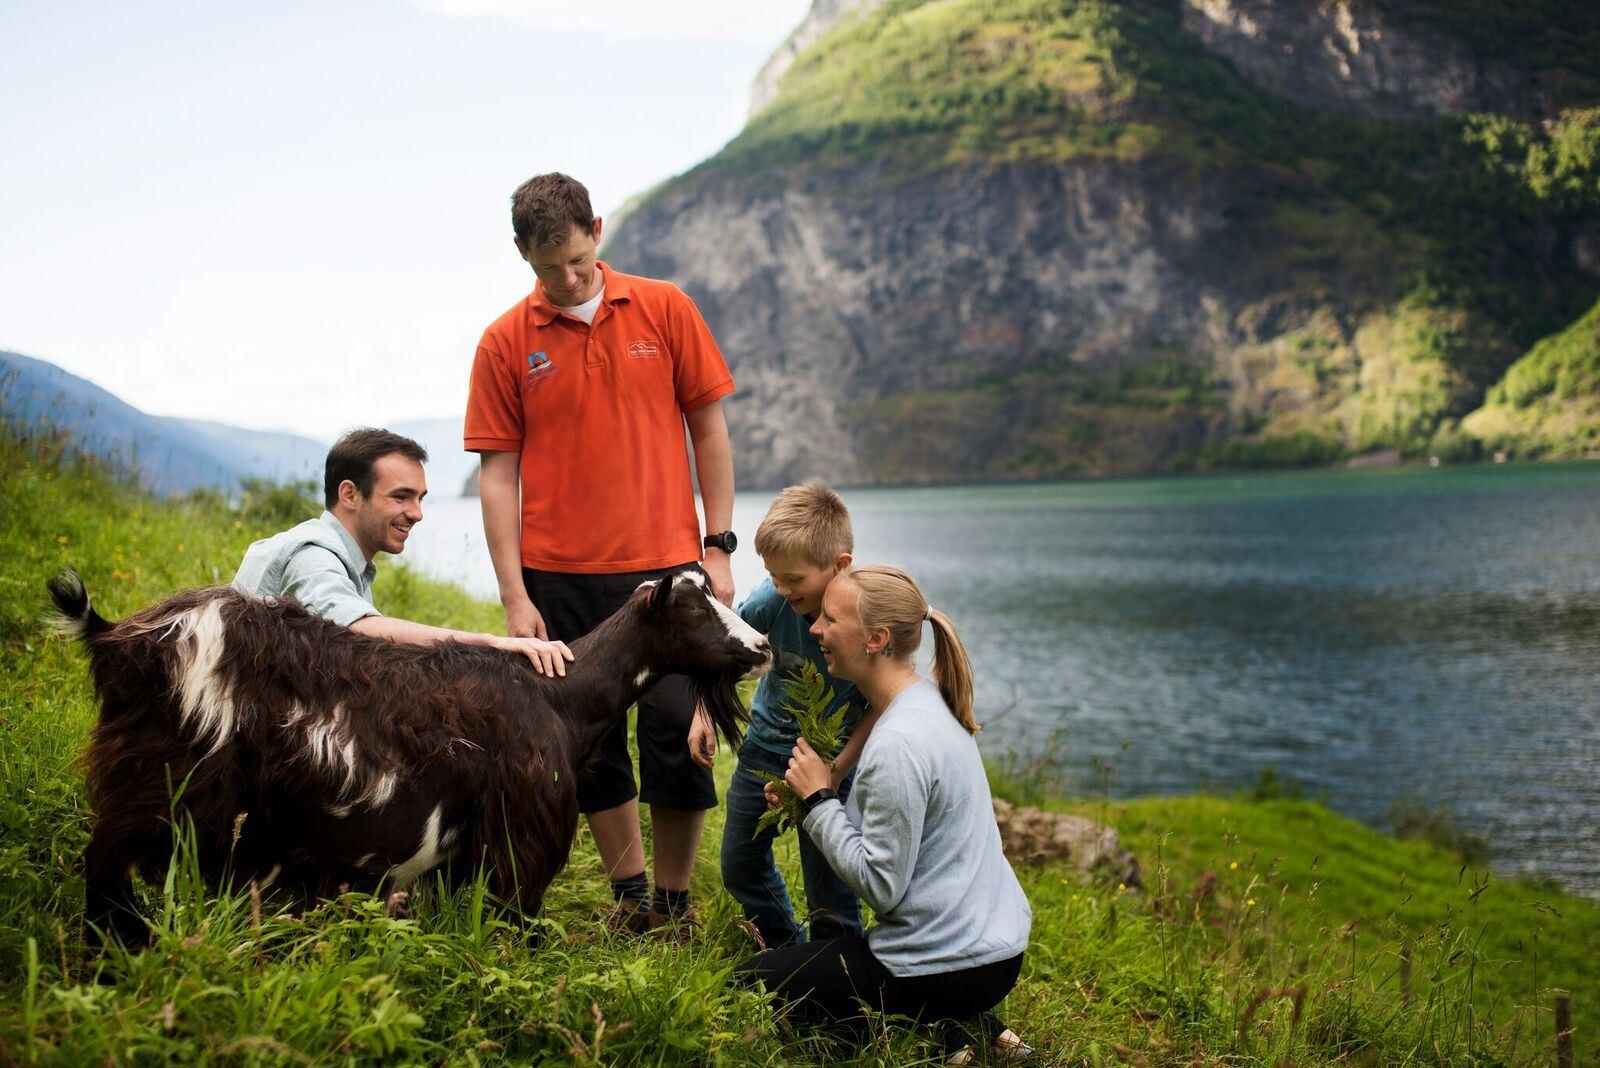 © Thea Hermansen, Explore Undredal Fjord Village